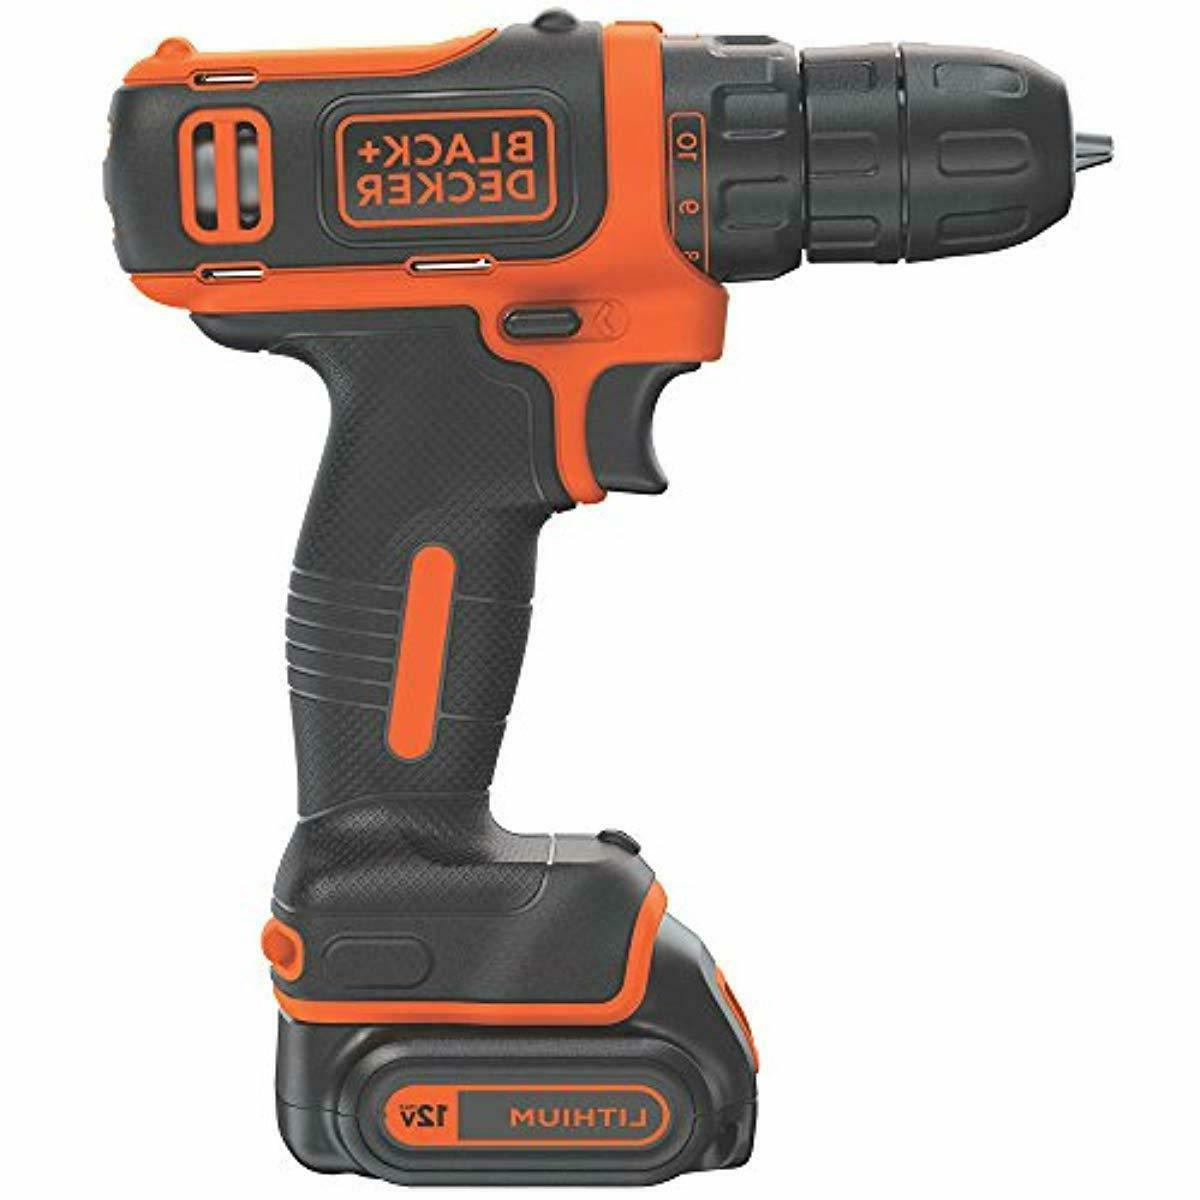 BLACK+DECKER 12V Cordless Drill/Driver